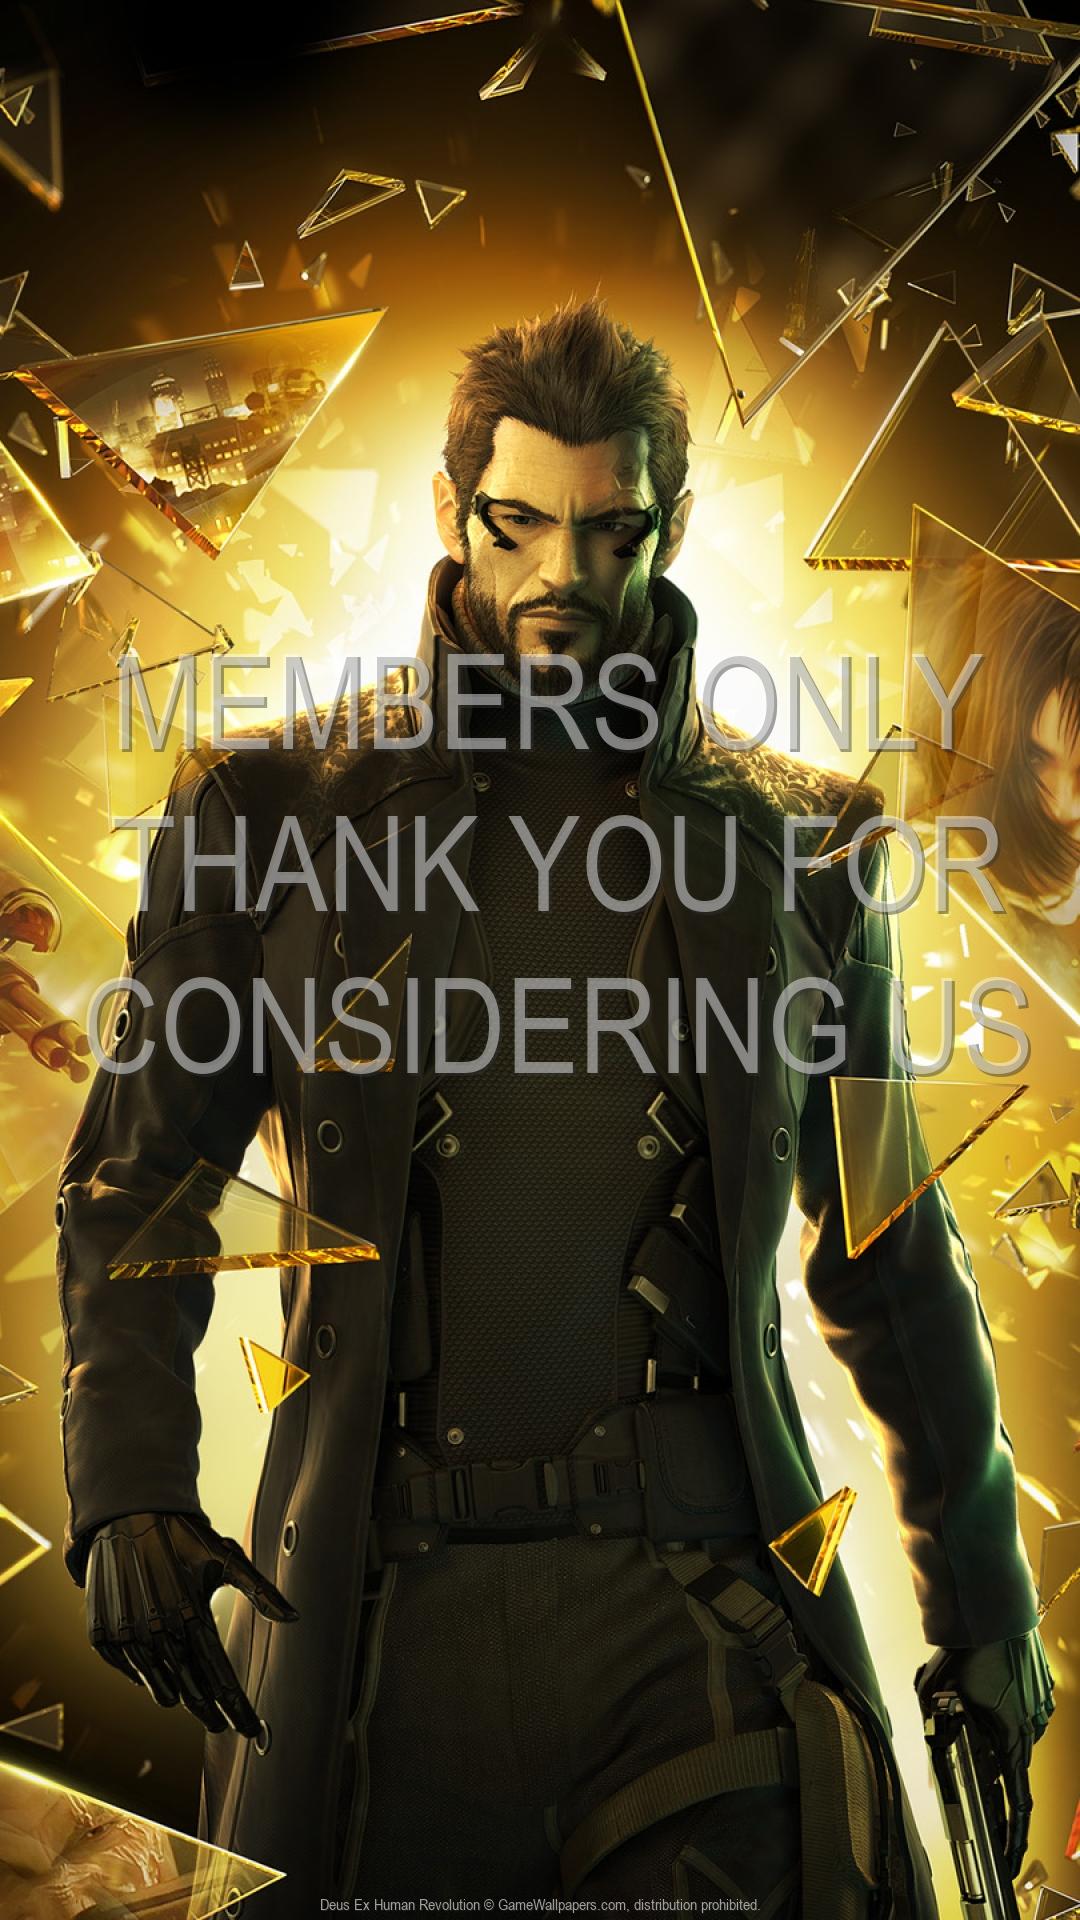 Deus Ex: Human Revolution 1920x1080 Mobile wallpaper or background 08